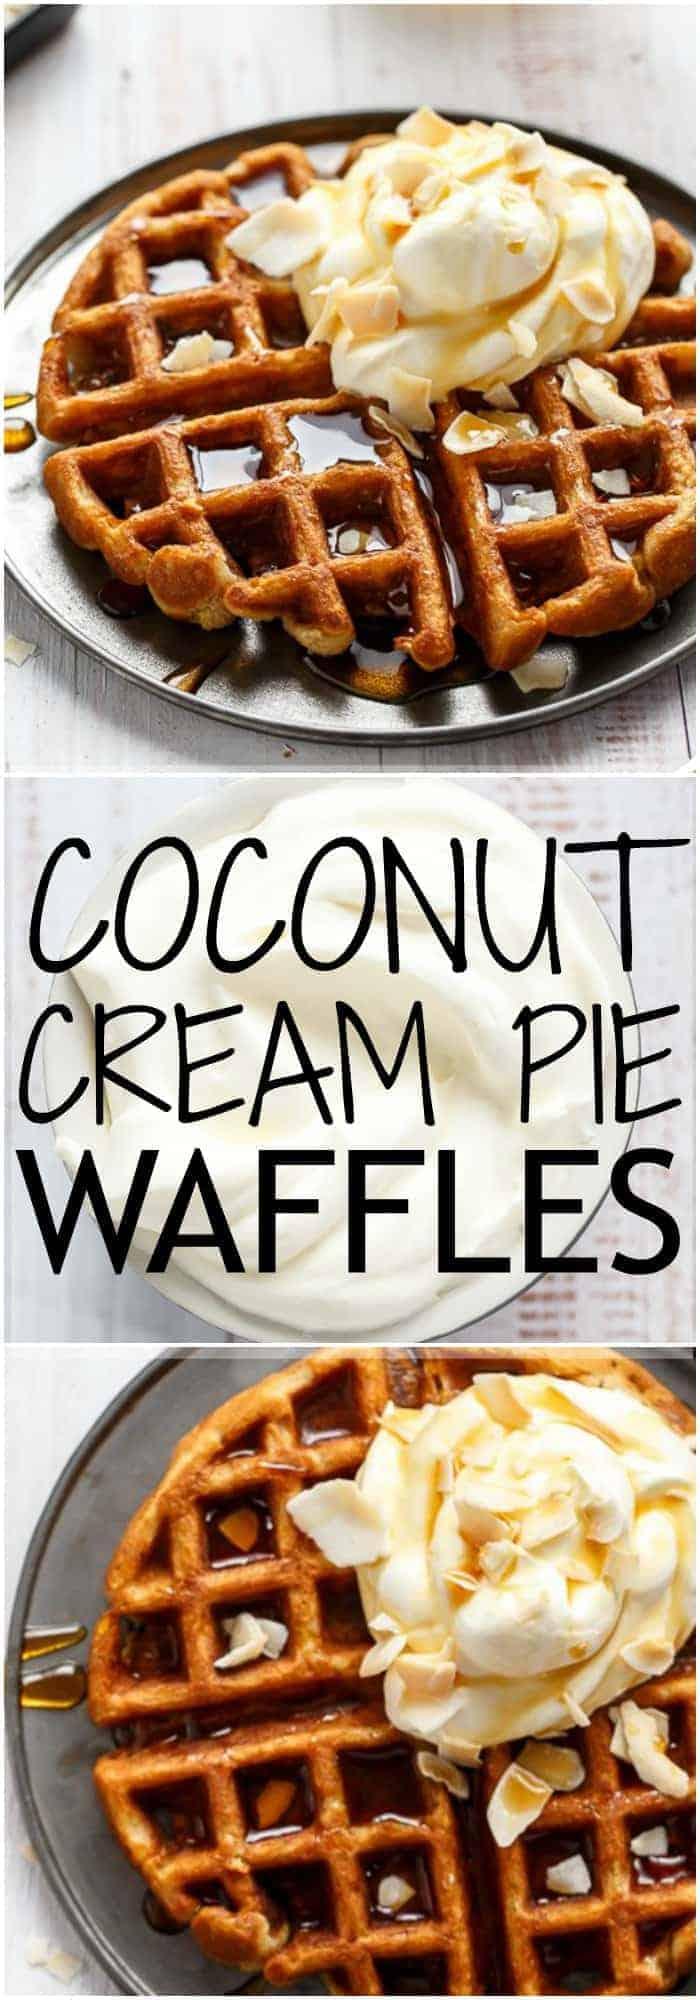 Coconut Cream Pie Waffles - Cafe Delites